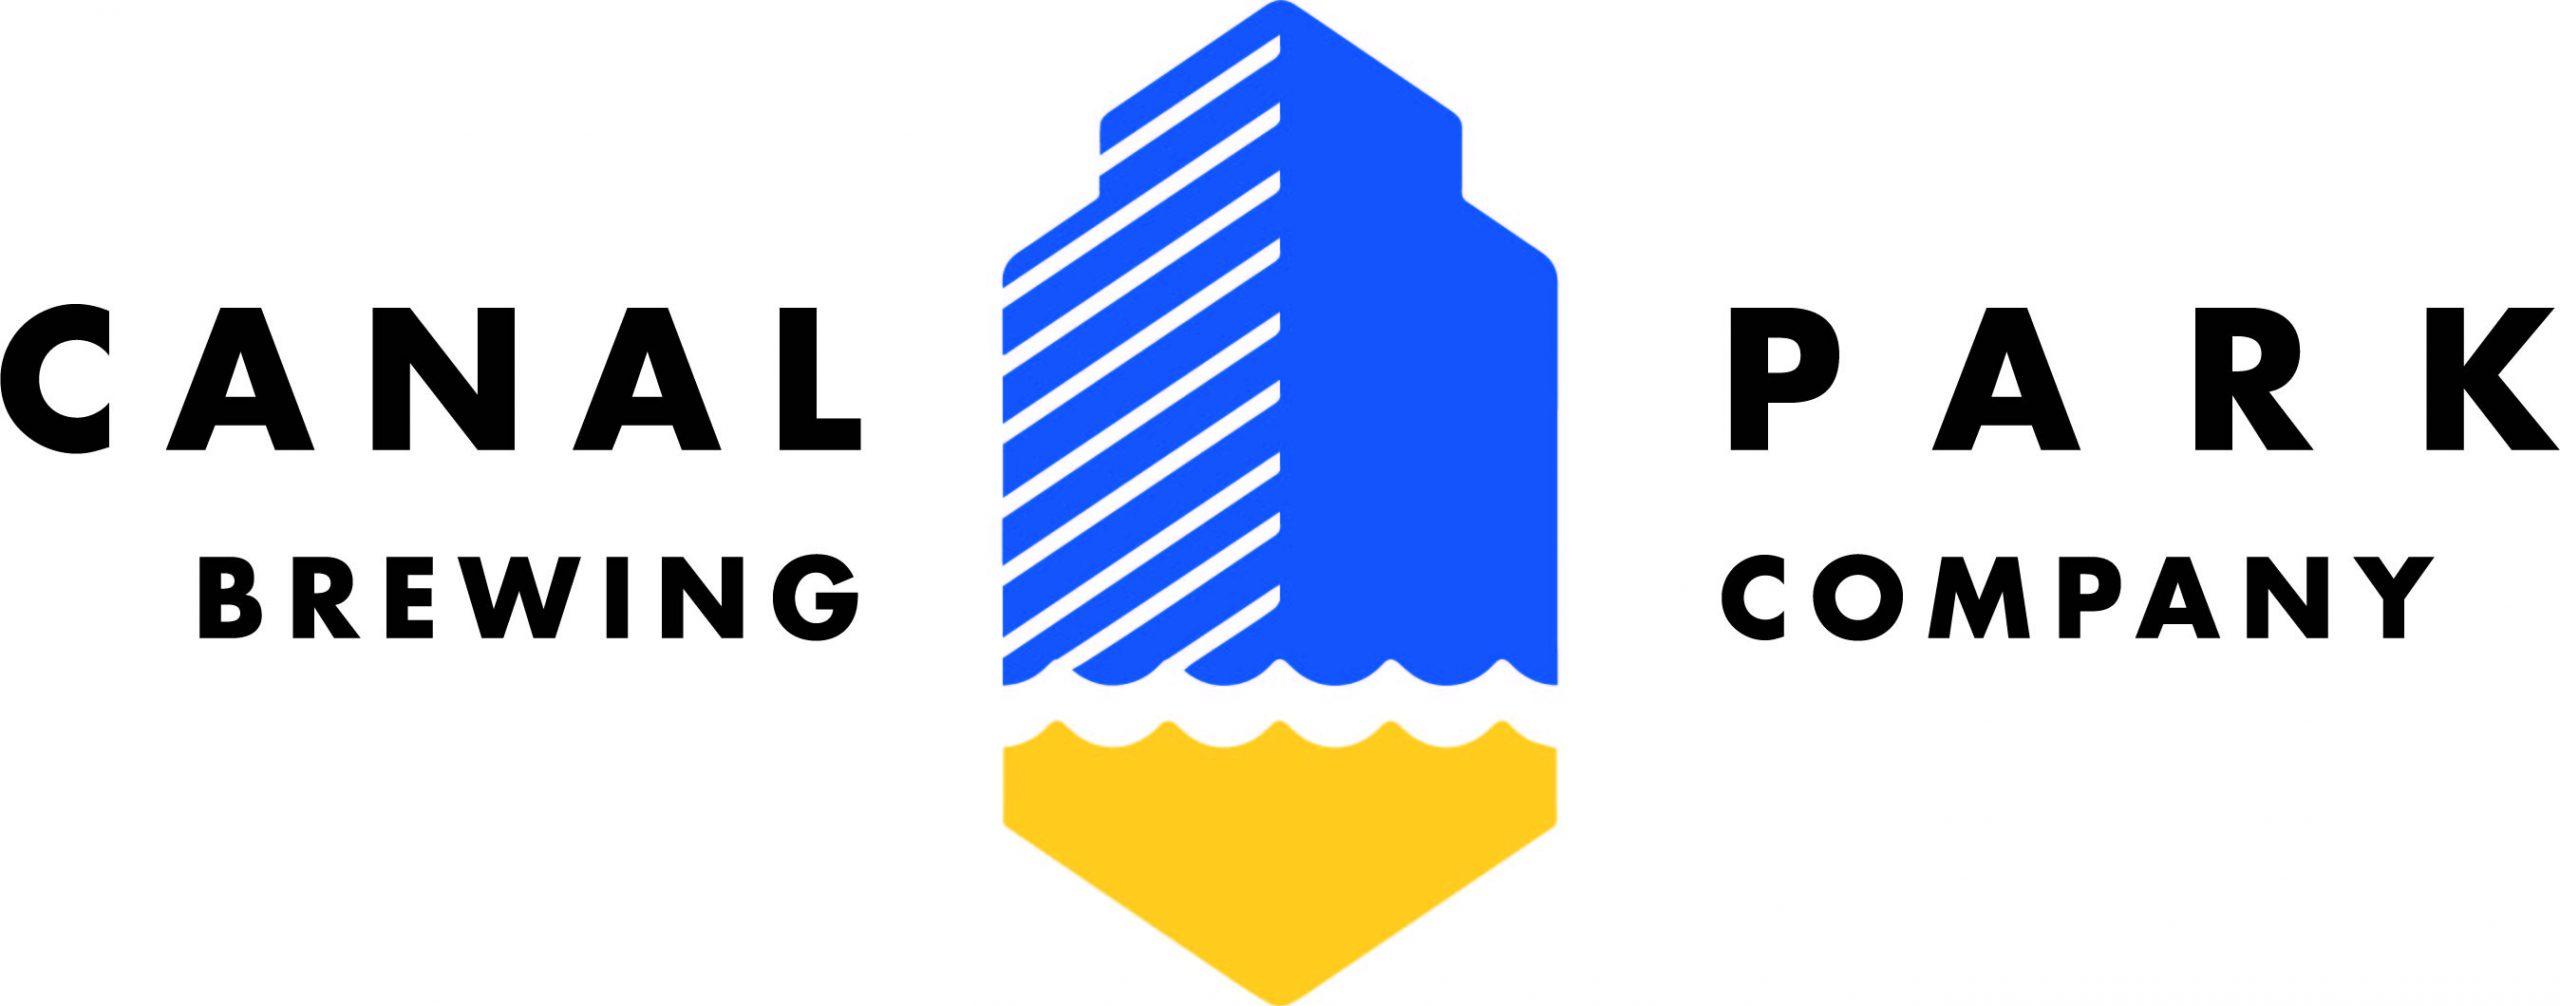 Canal Park Brewing Company Logo